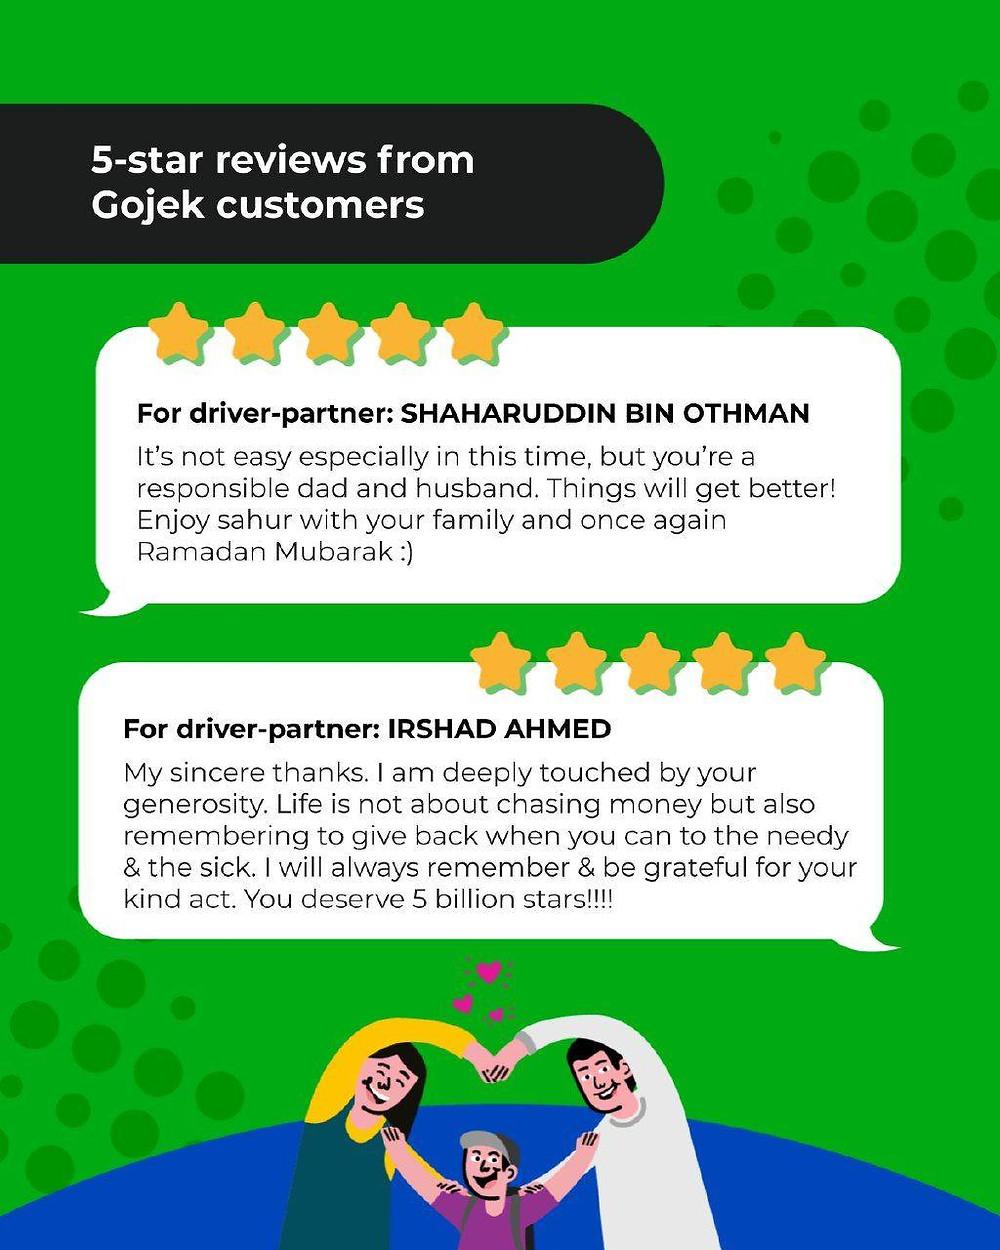 Gojek customer reviews